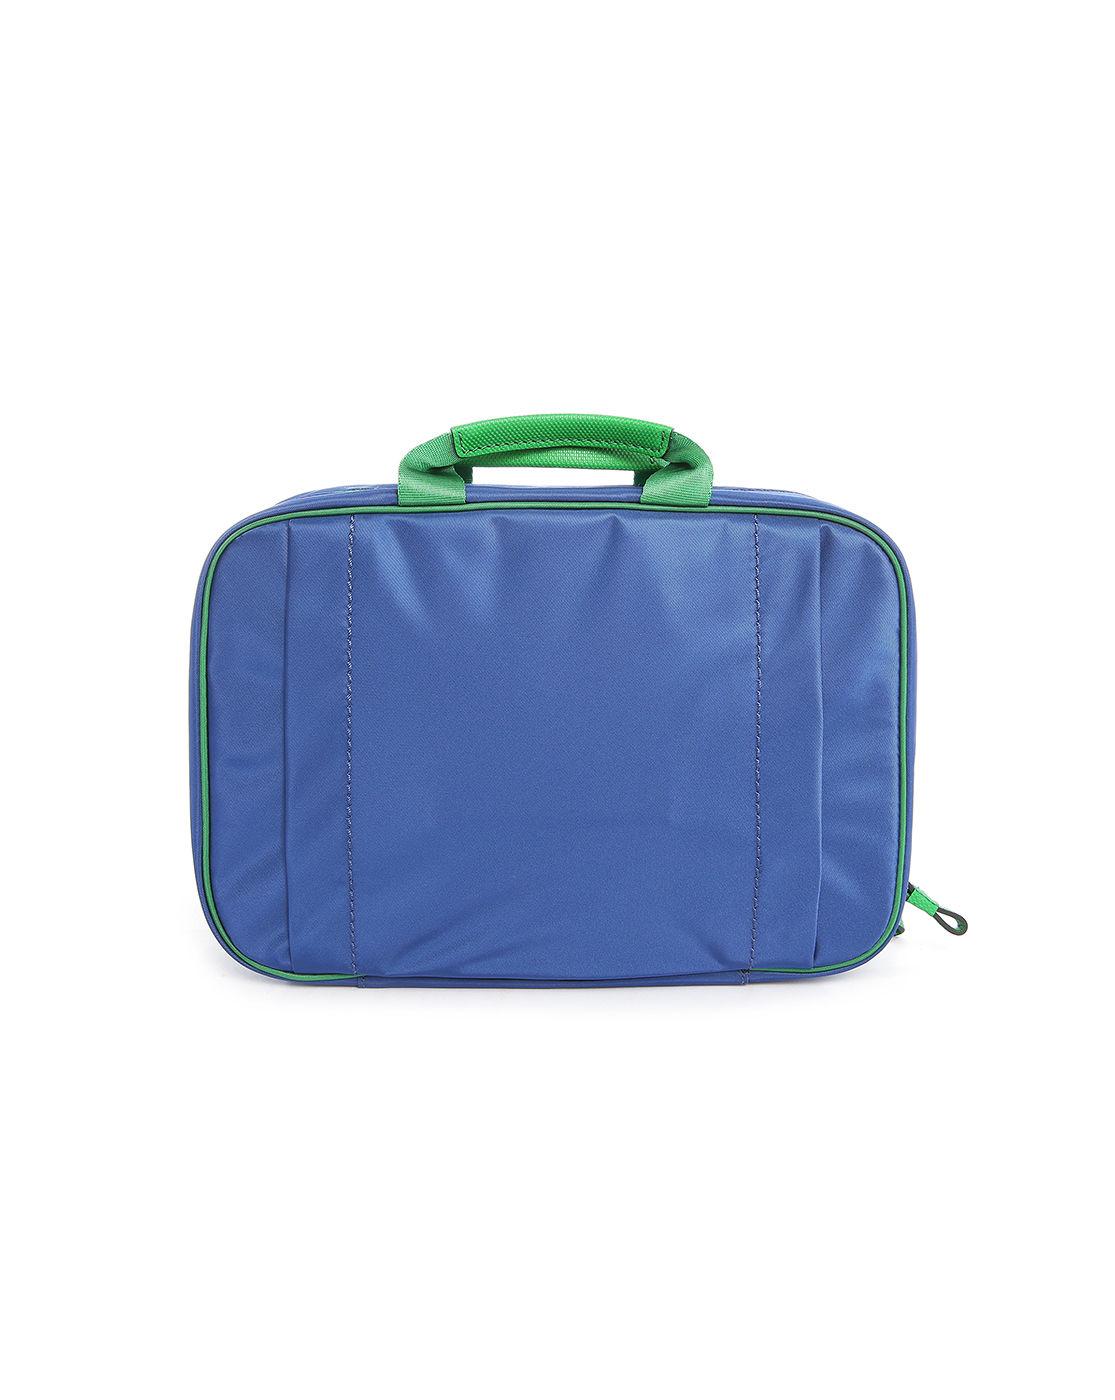 tumi trousse de toilette bleue monaco travel kit journey